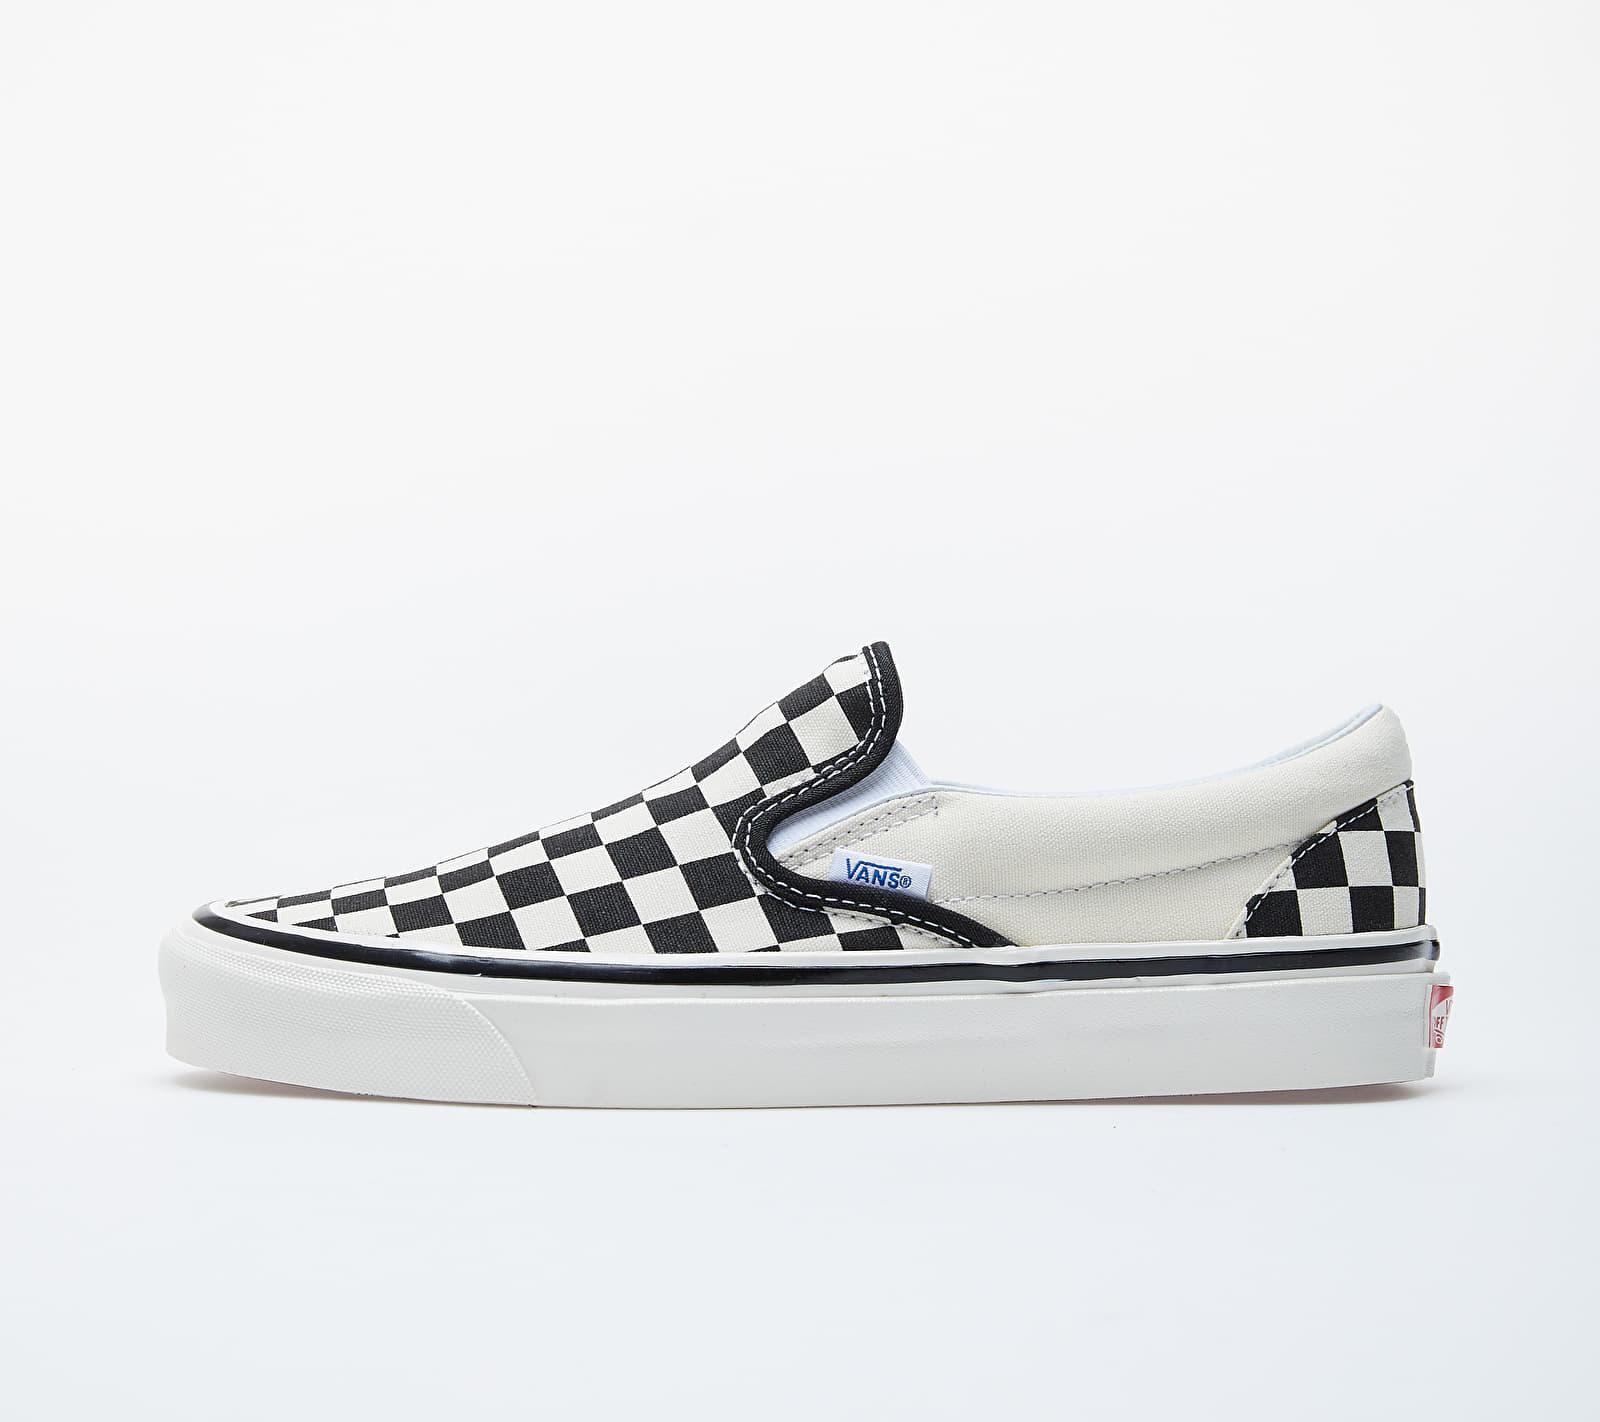 Vans Classic Slip-On 98 DX (Anaheim Factory) Checkerboard EUR 46